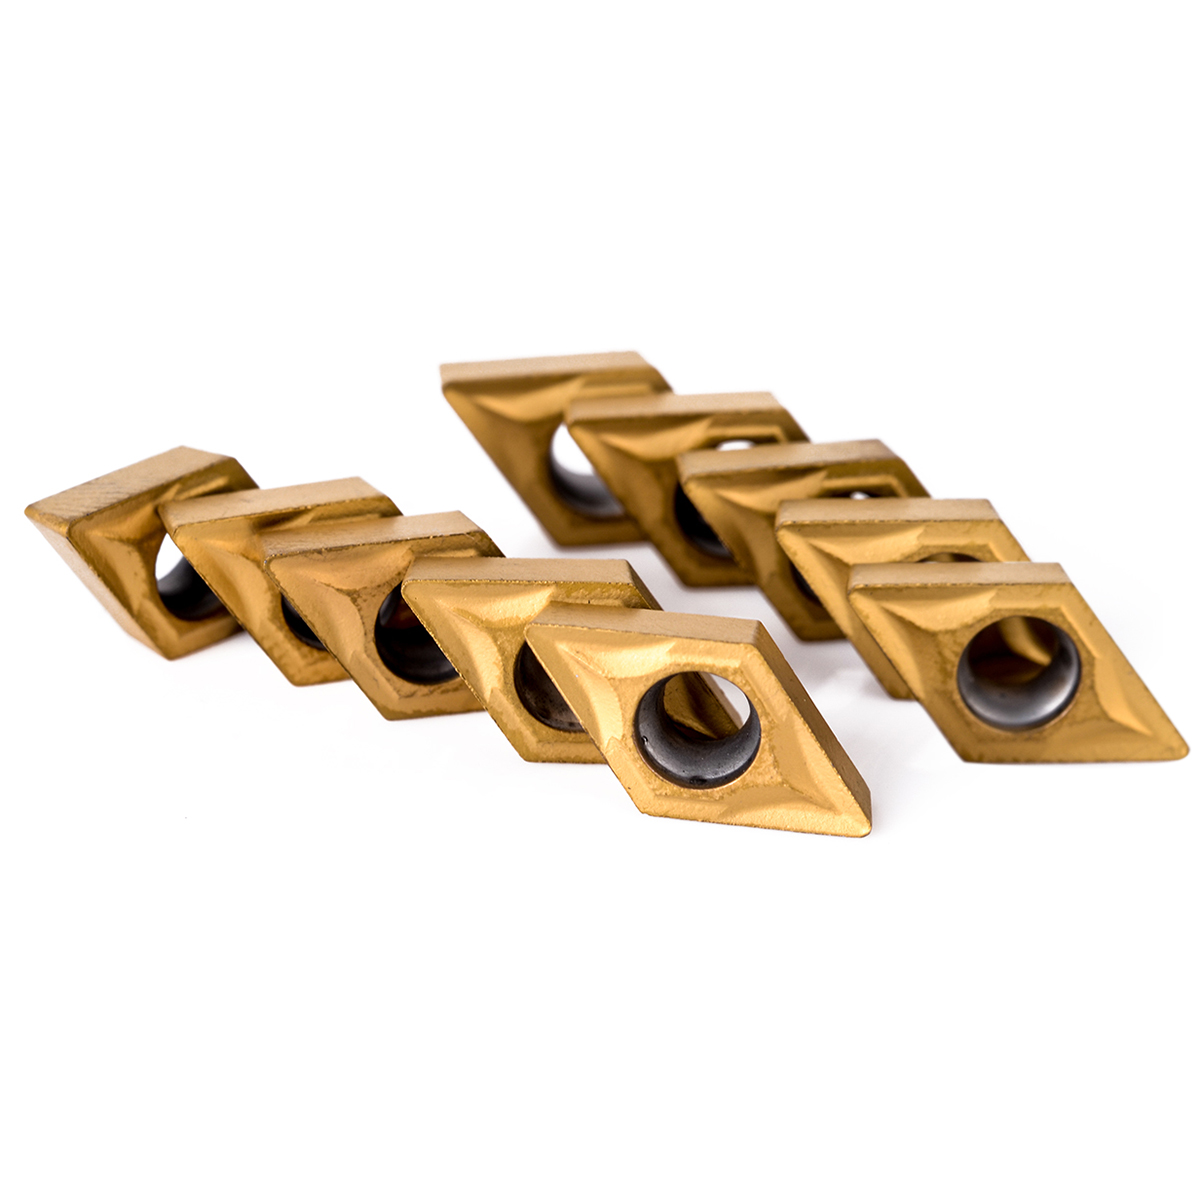 Купить с кэшбэком 10pcs DCMT070204 Carbide Inserts Blades + 4Pcs 12mm Straight Shank Boring Bar CNC Lathe  Turning Tool Holder + 4pcs Wrenches